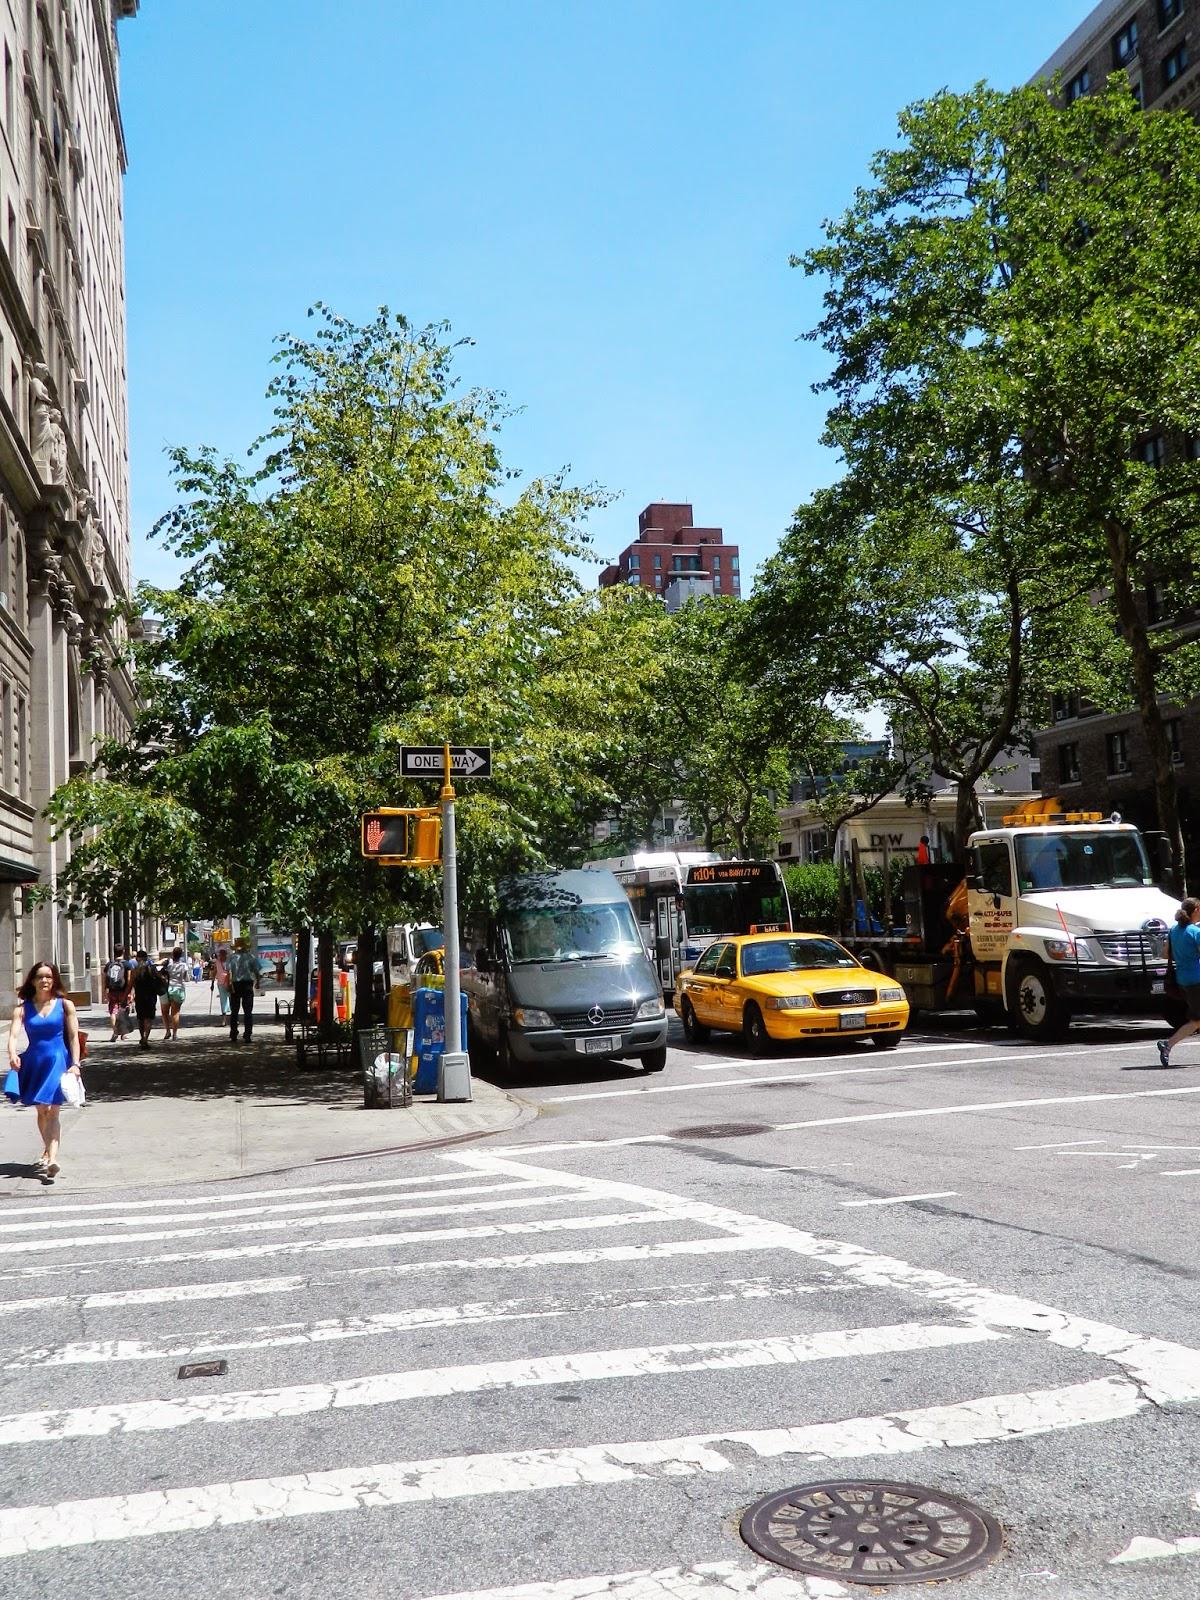 new york city street yellow taxi stop sign